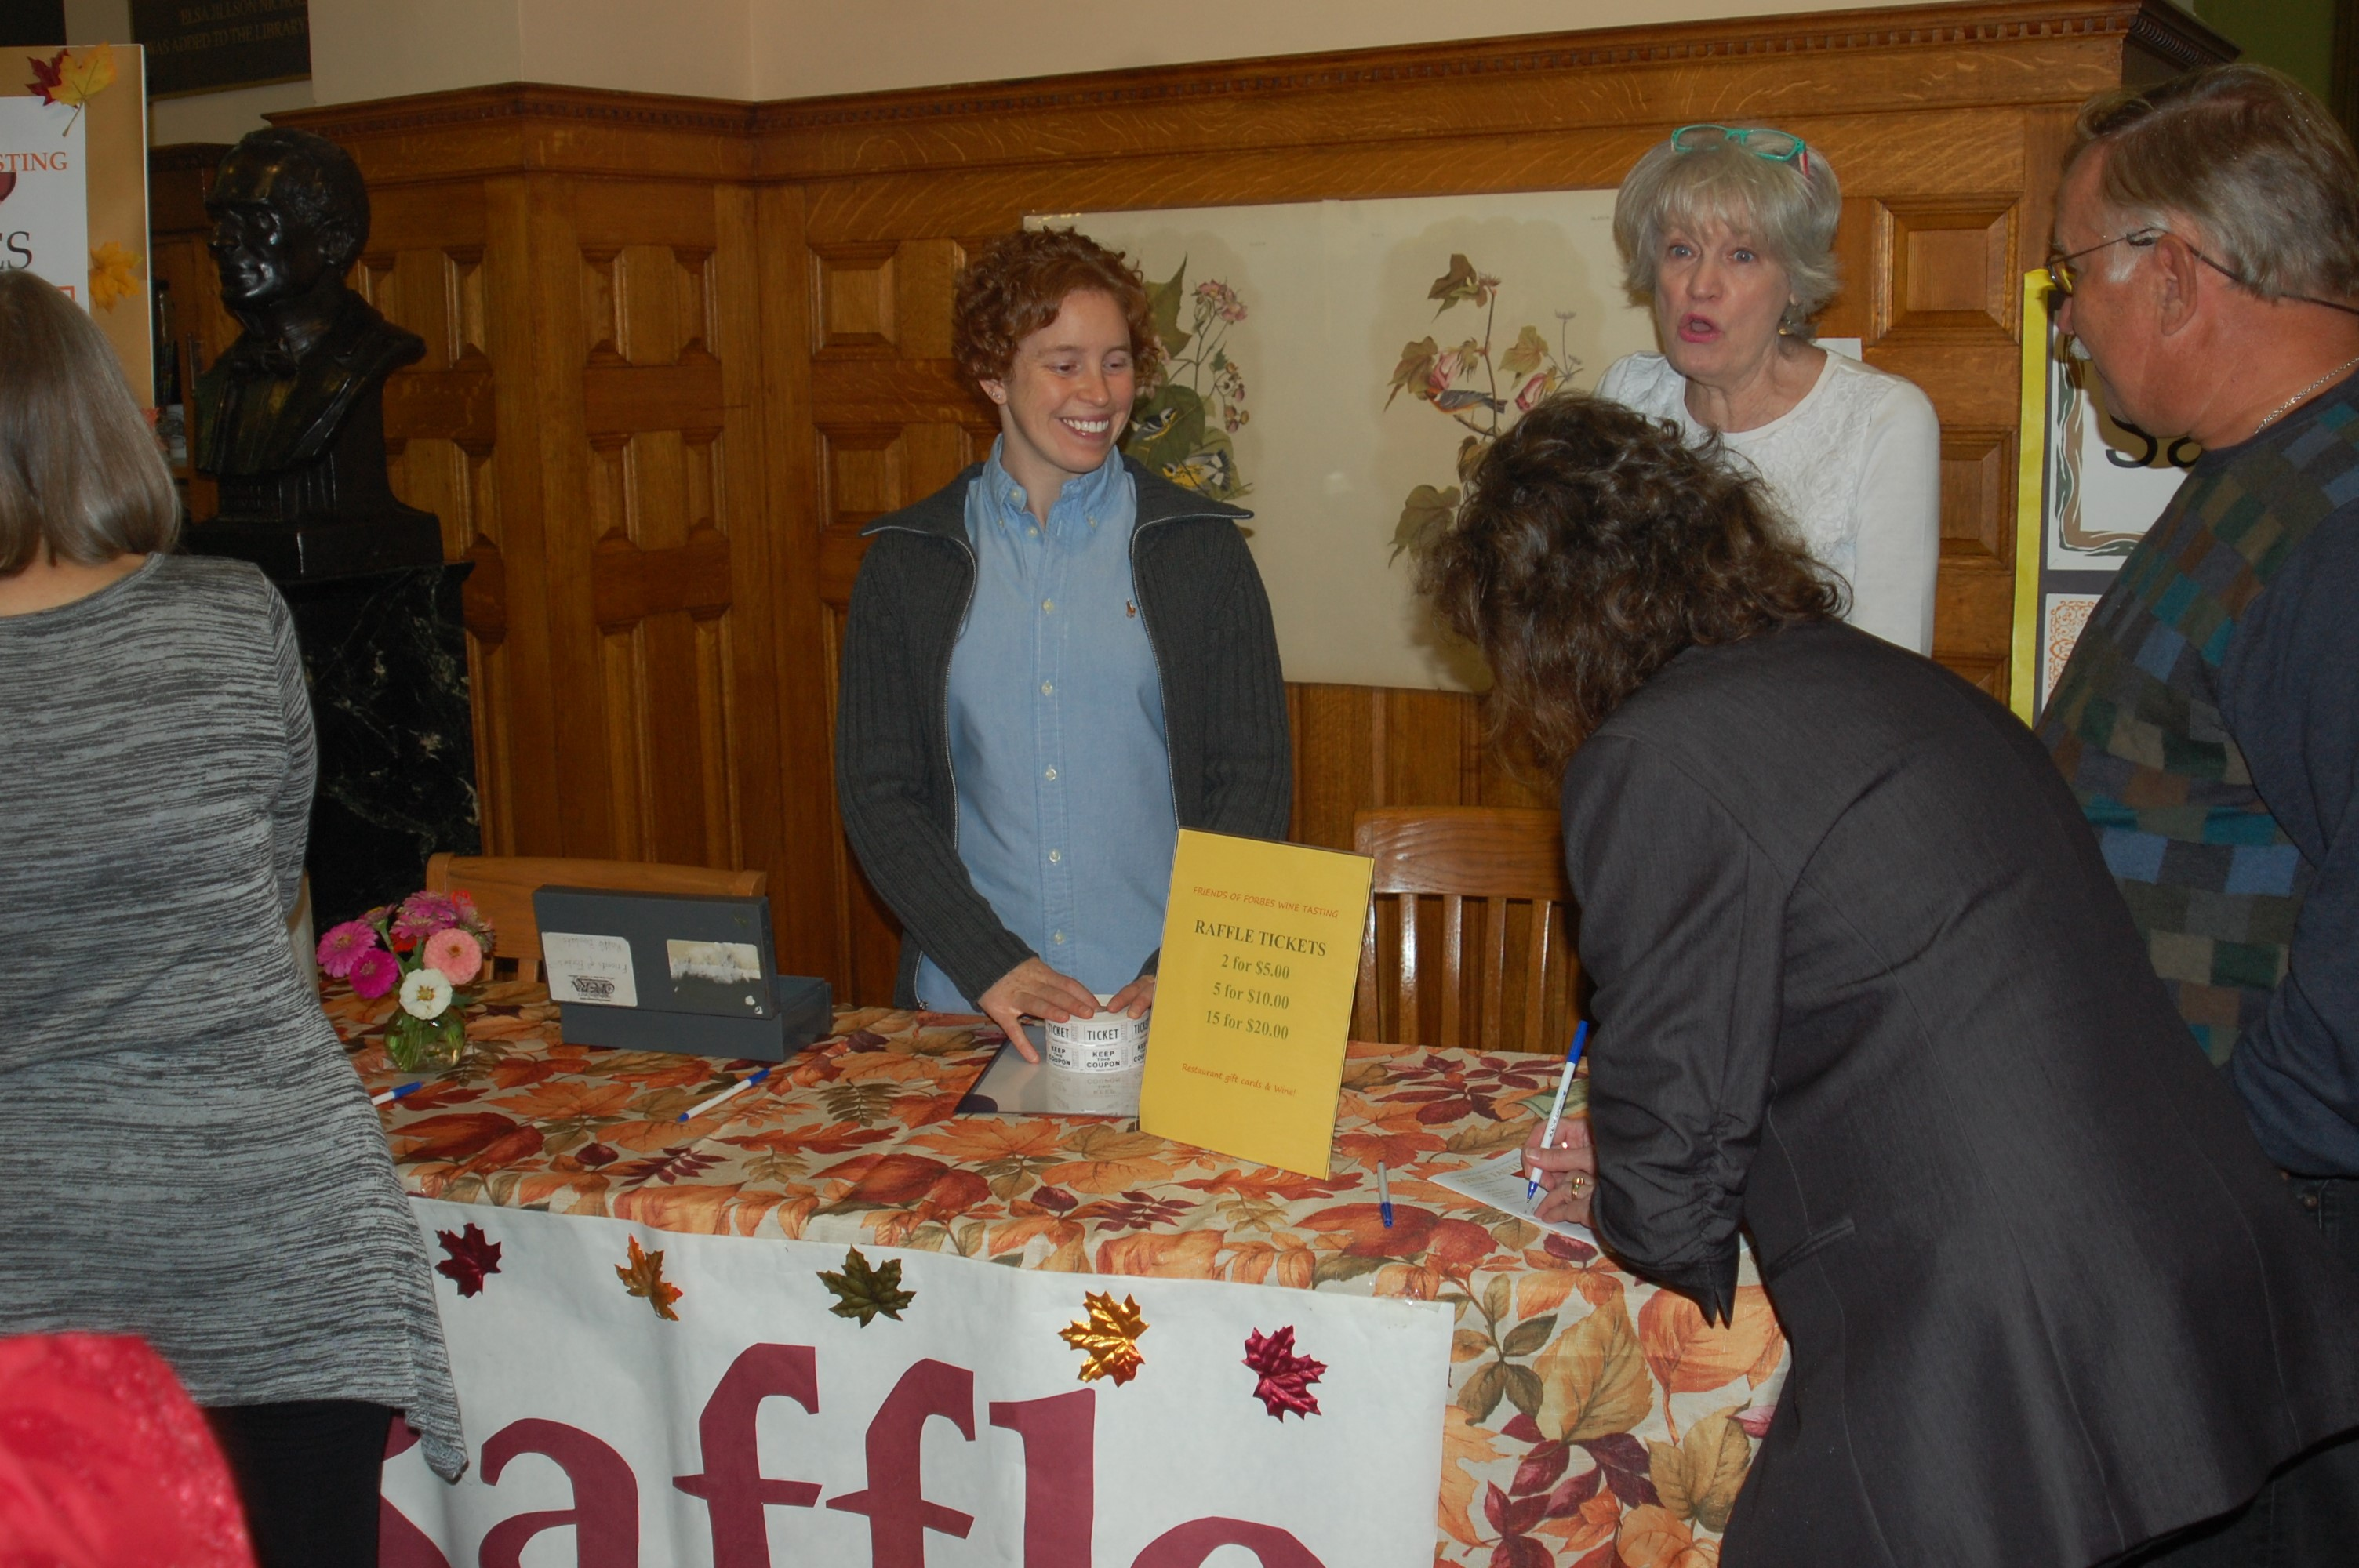 Raffle table